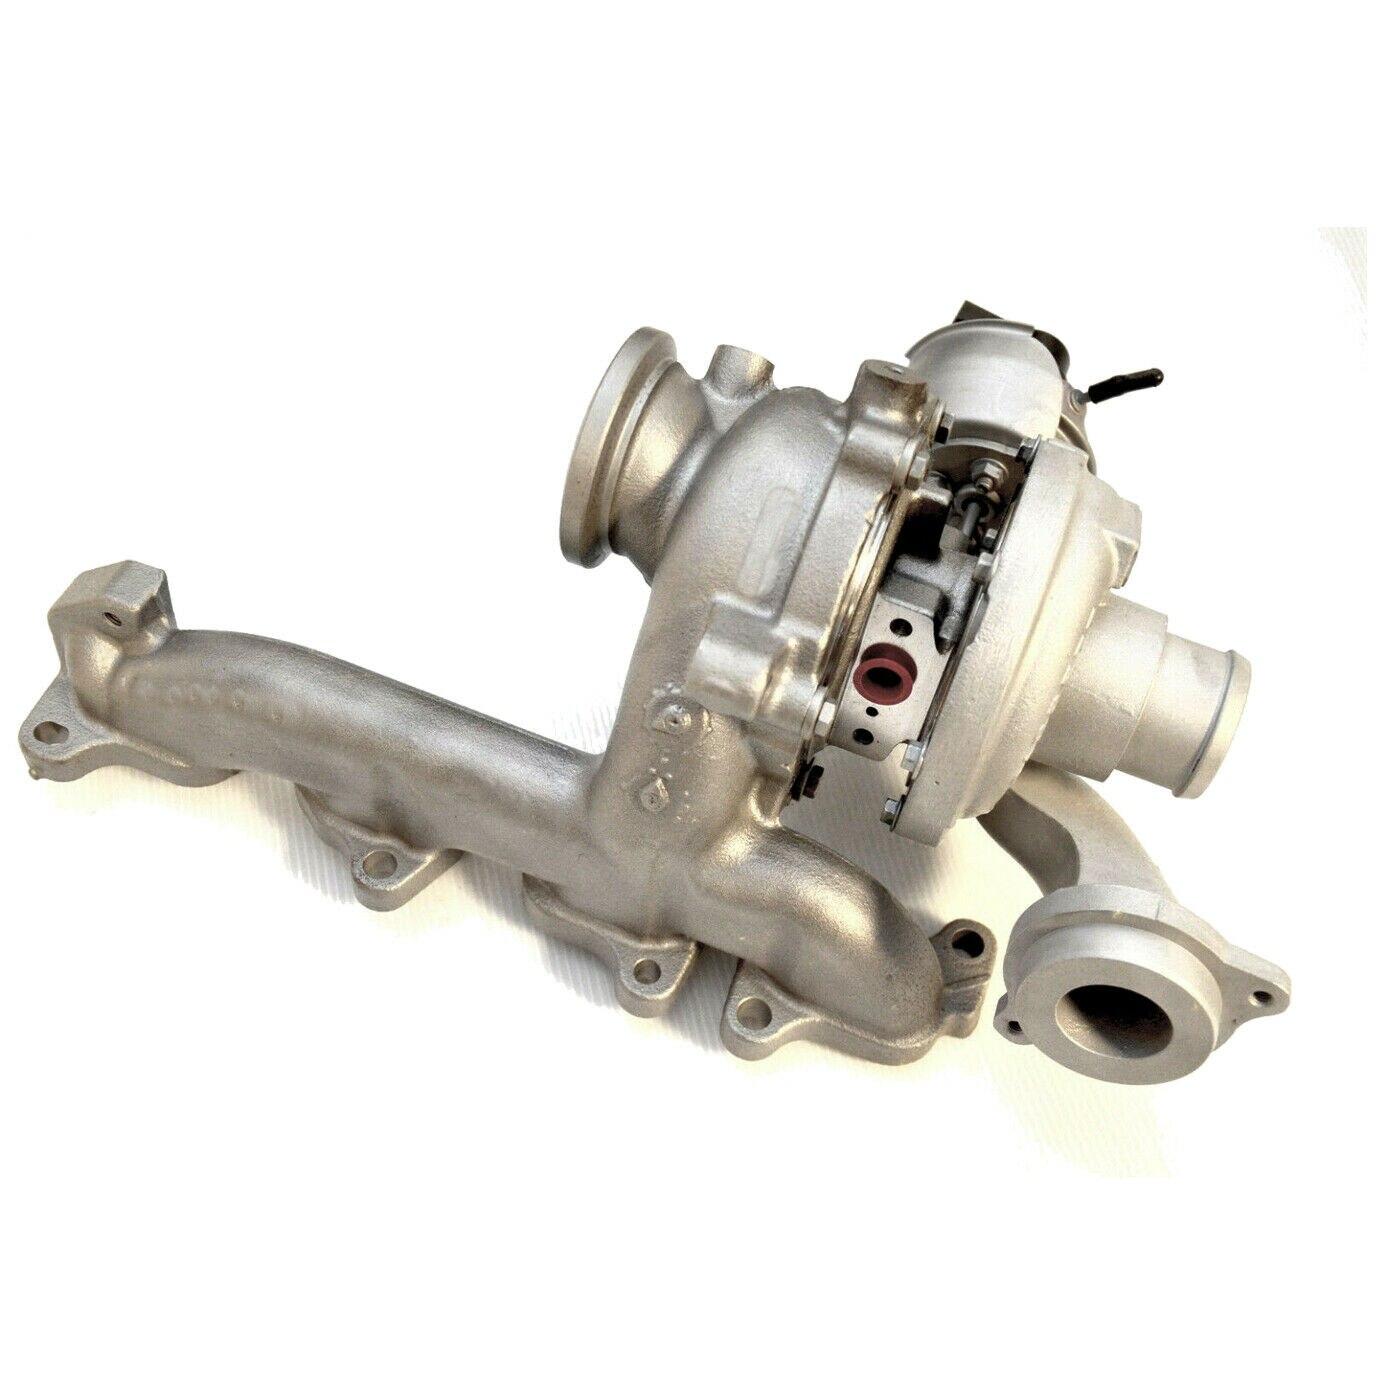 Ap01 turbocompressor vw crafter 30-35 30-50 amarok 2.0 tdi cktc cktb cnfa 803955 803955-0003 803955-5005 s 803955-0005